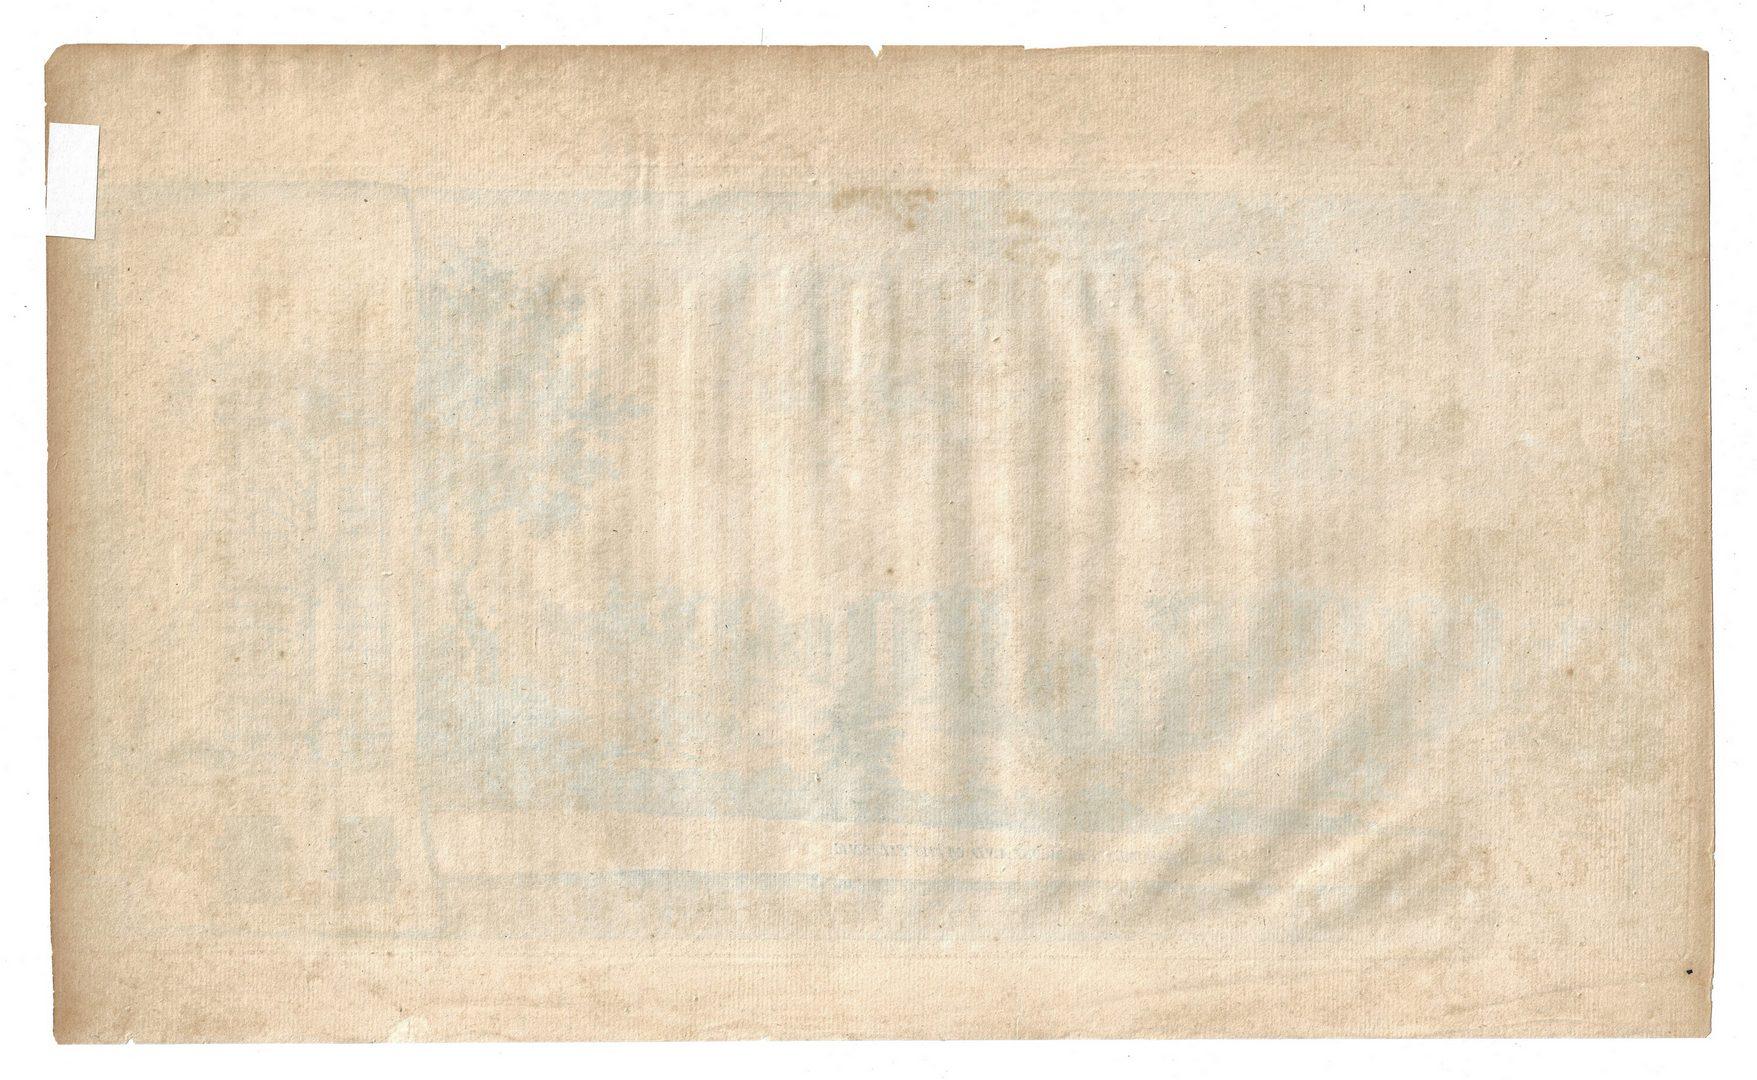 Lot 314: 38 Richard Pococke Egyptian/Classical Engravings